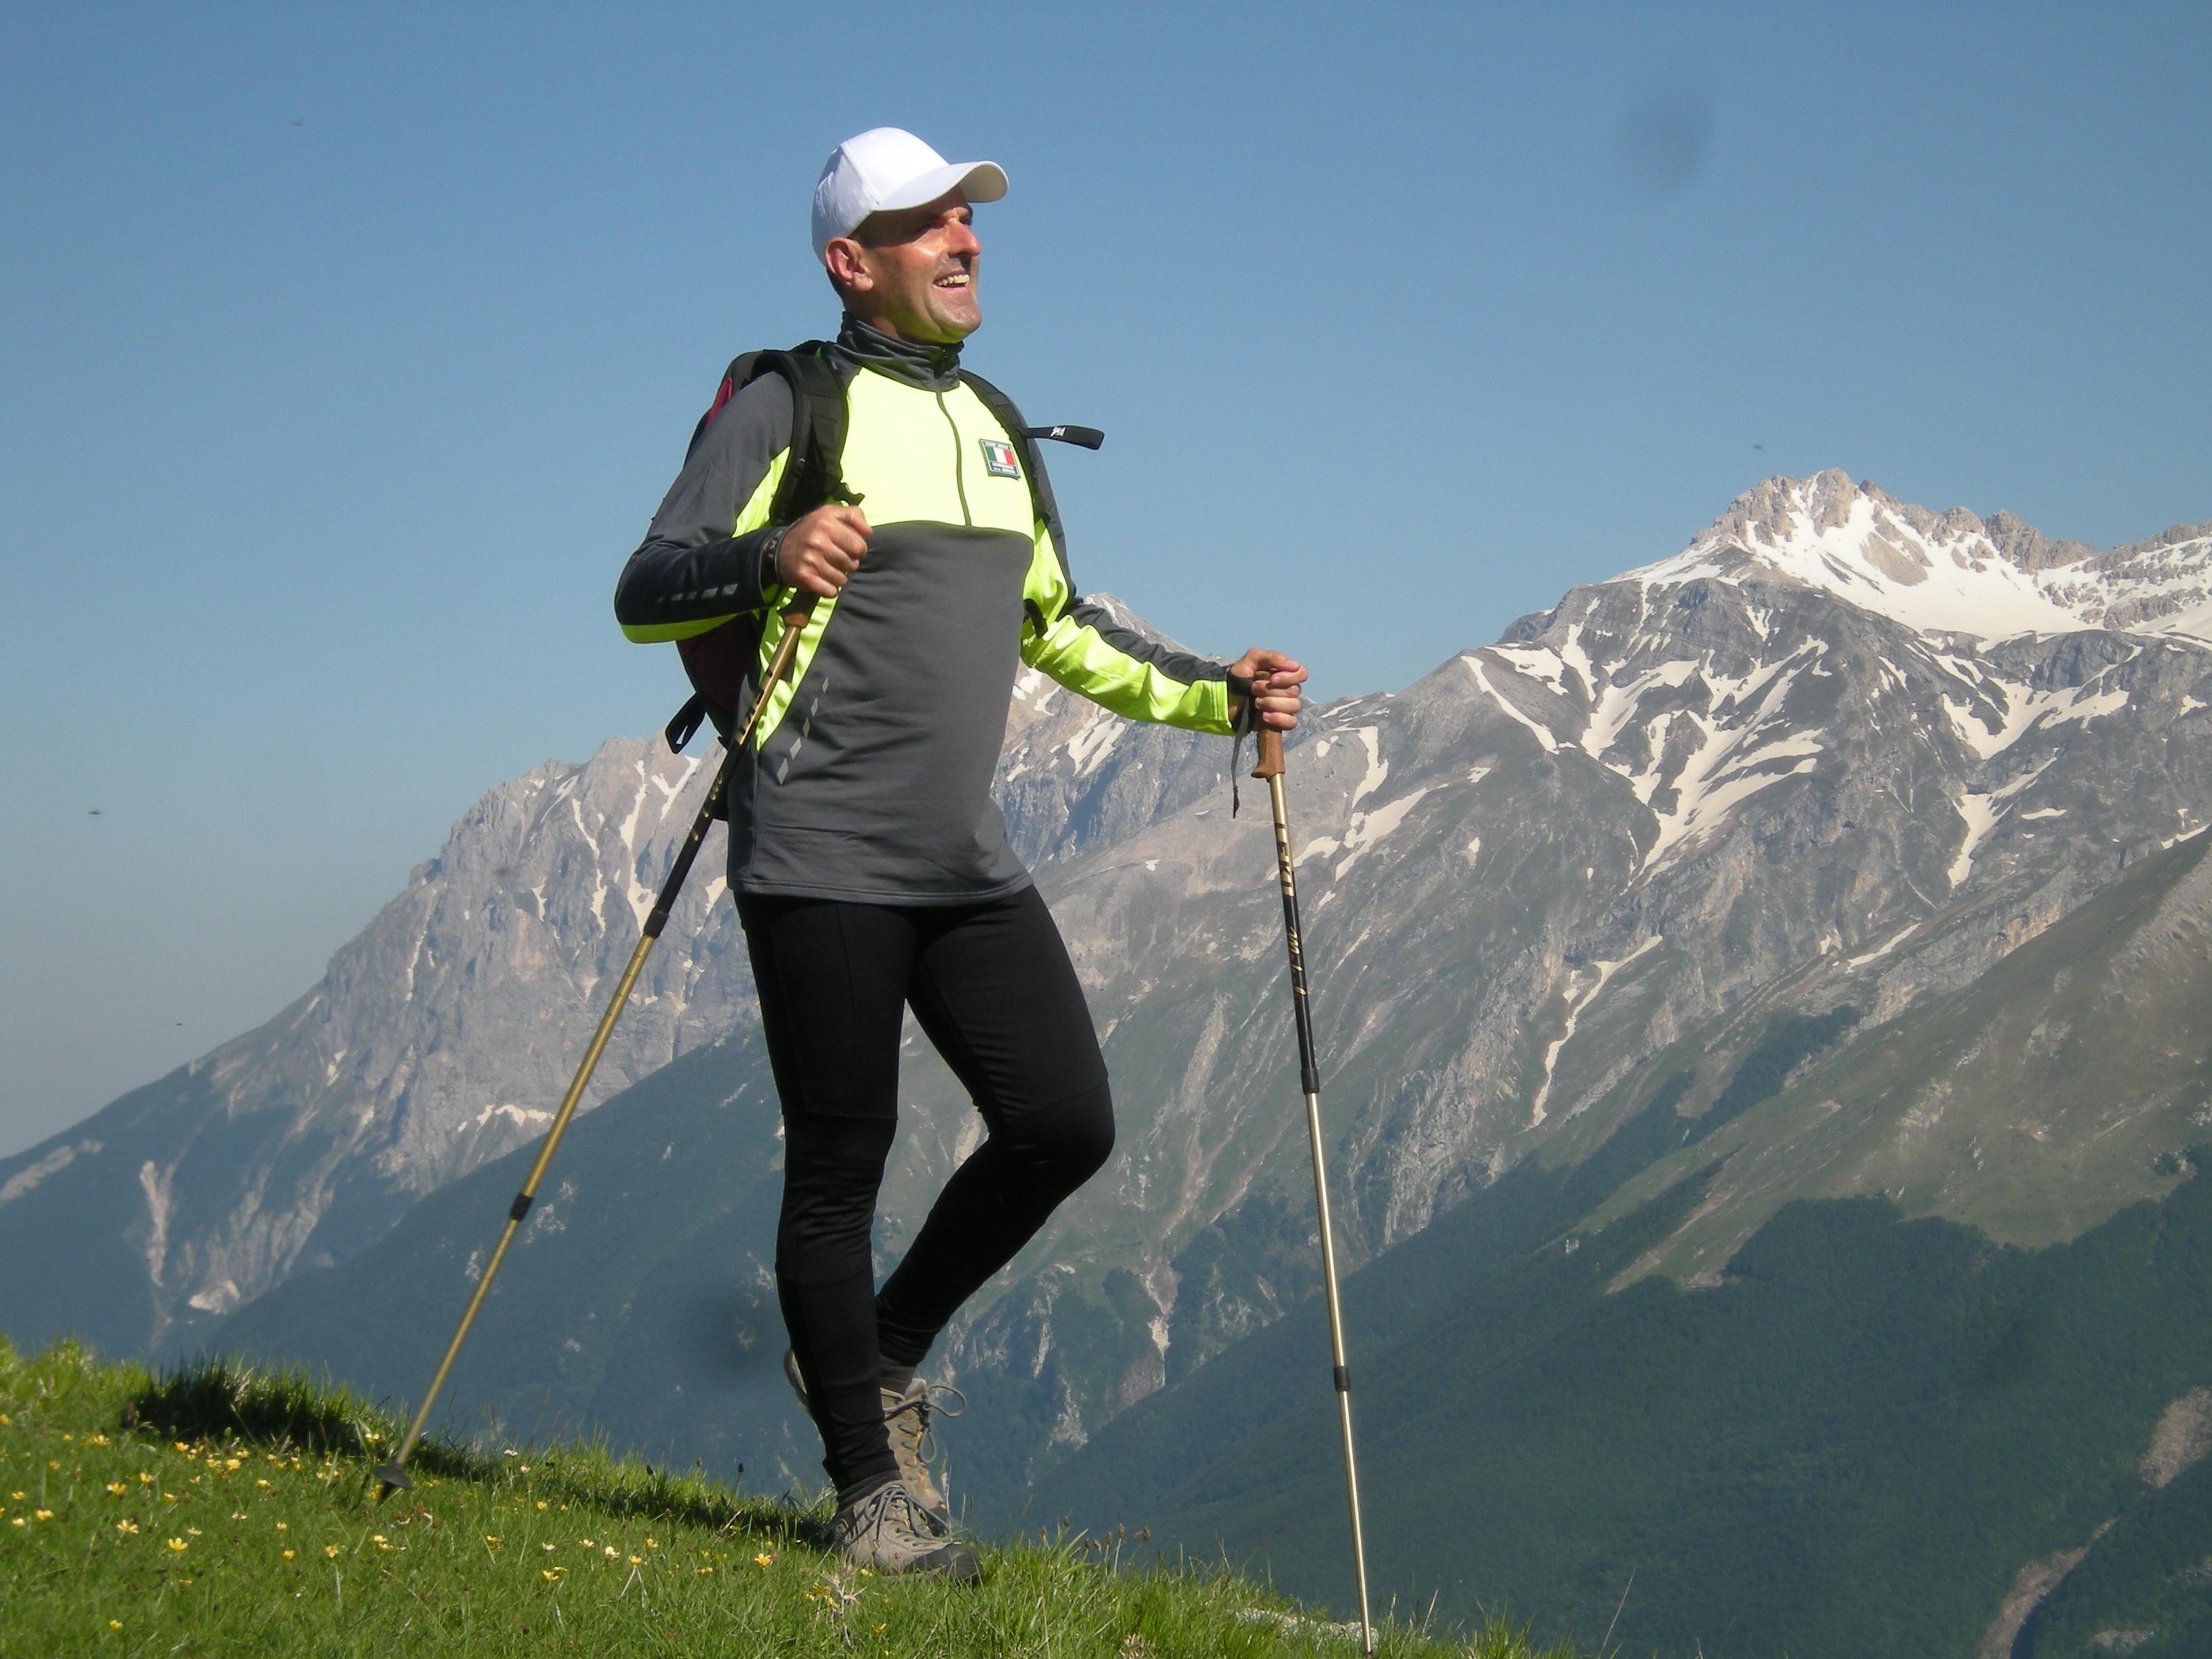 buy popular 13f6f 0e308 Elisoccorso in montagna, esperto: